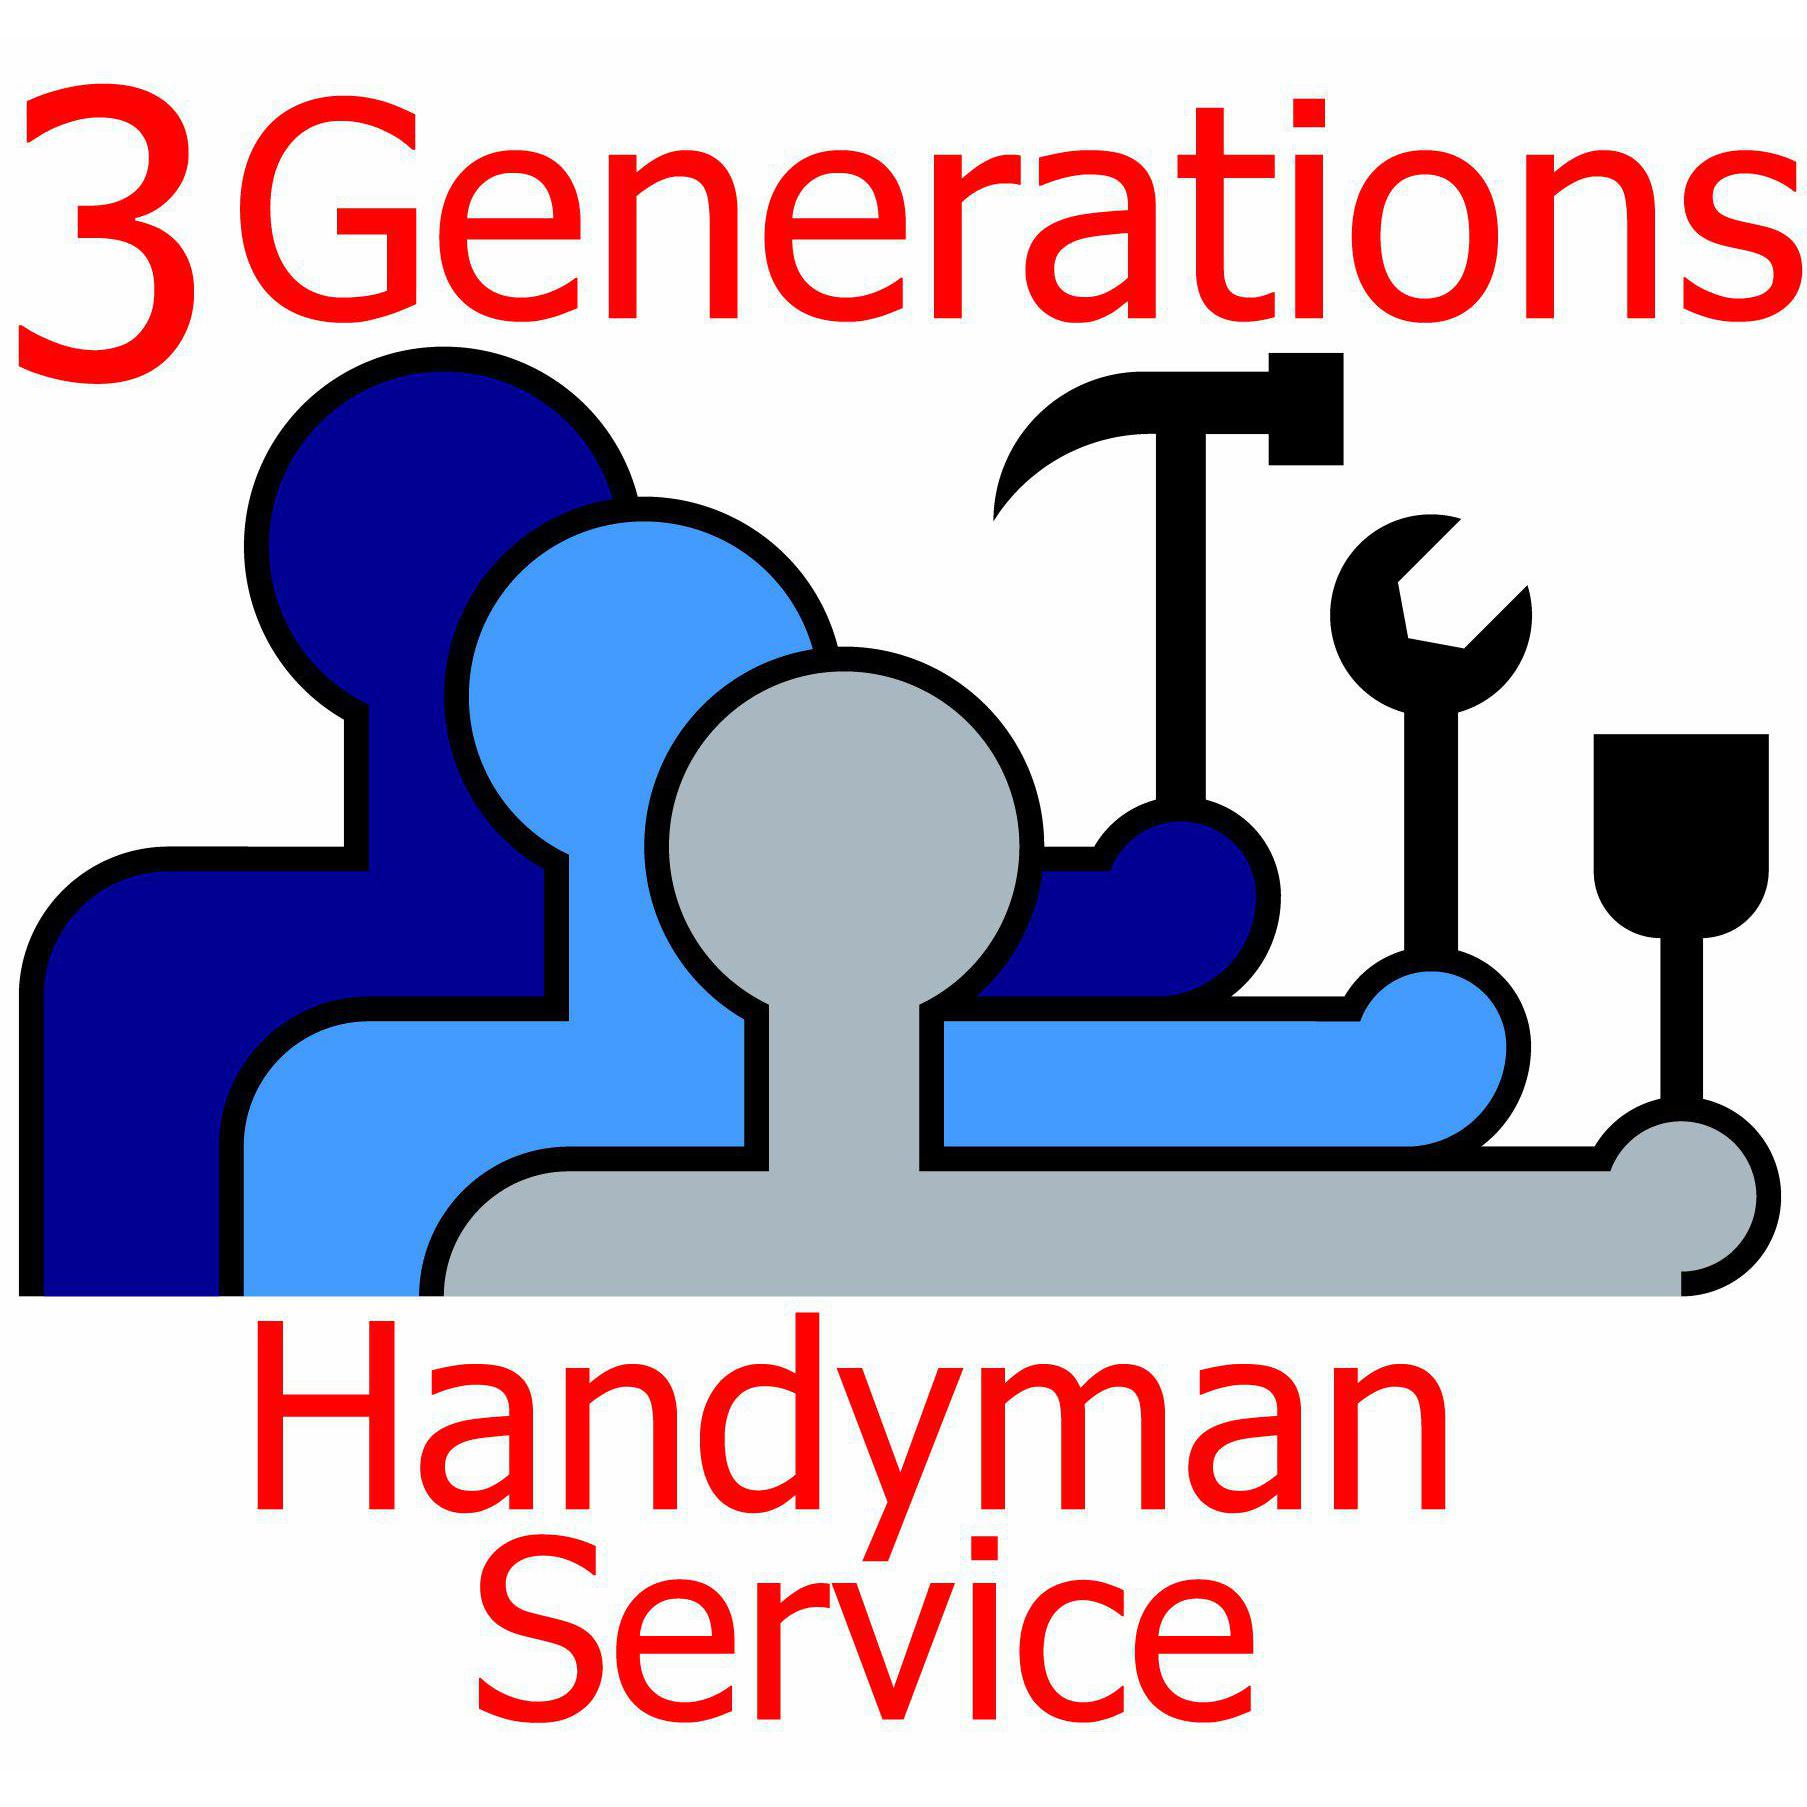 3 Generations Handyman Service